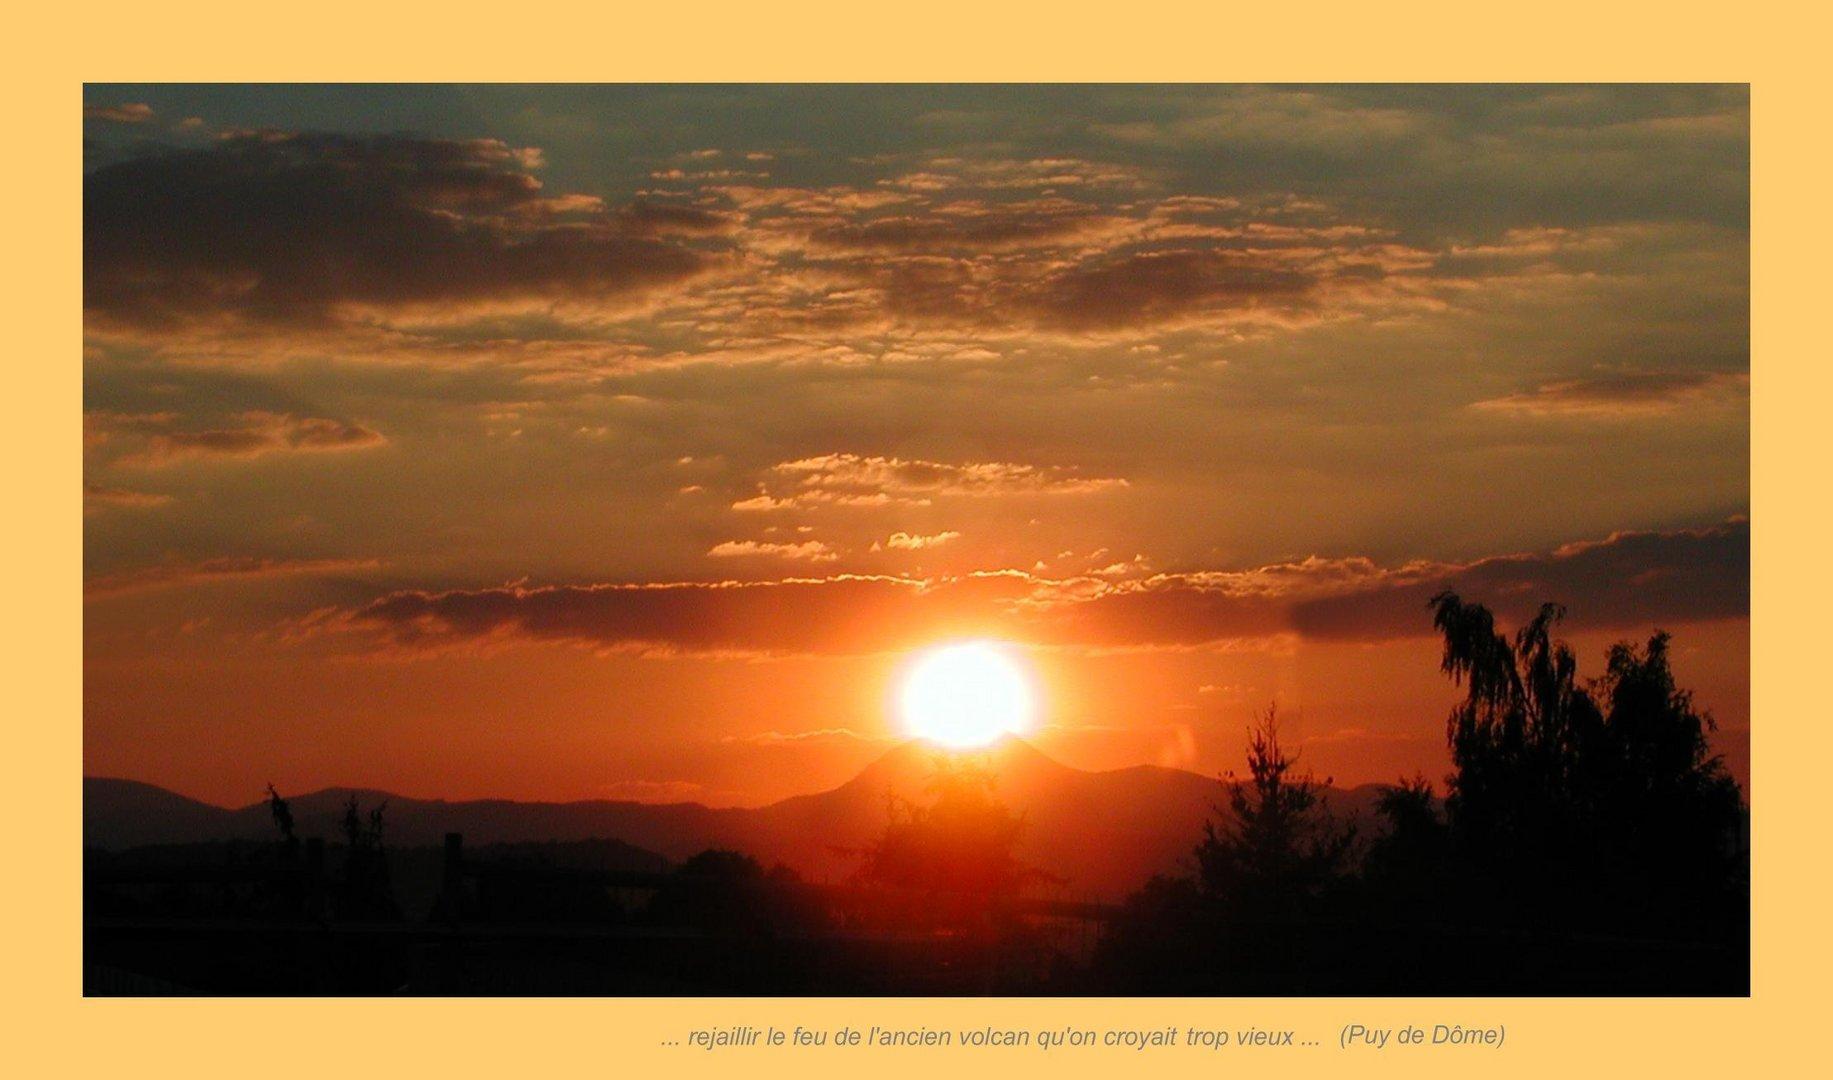 Quand le volcan gobe le soleil